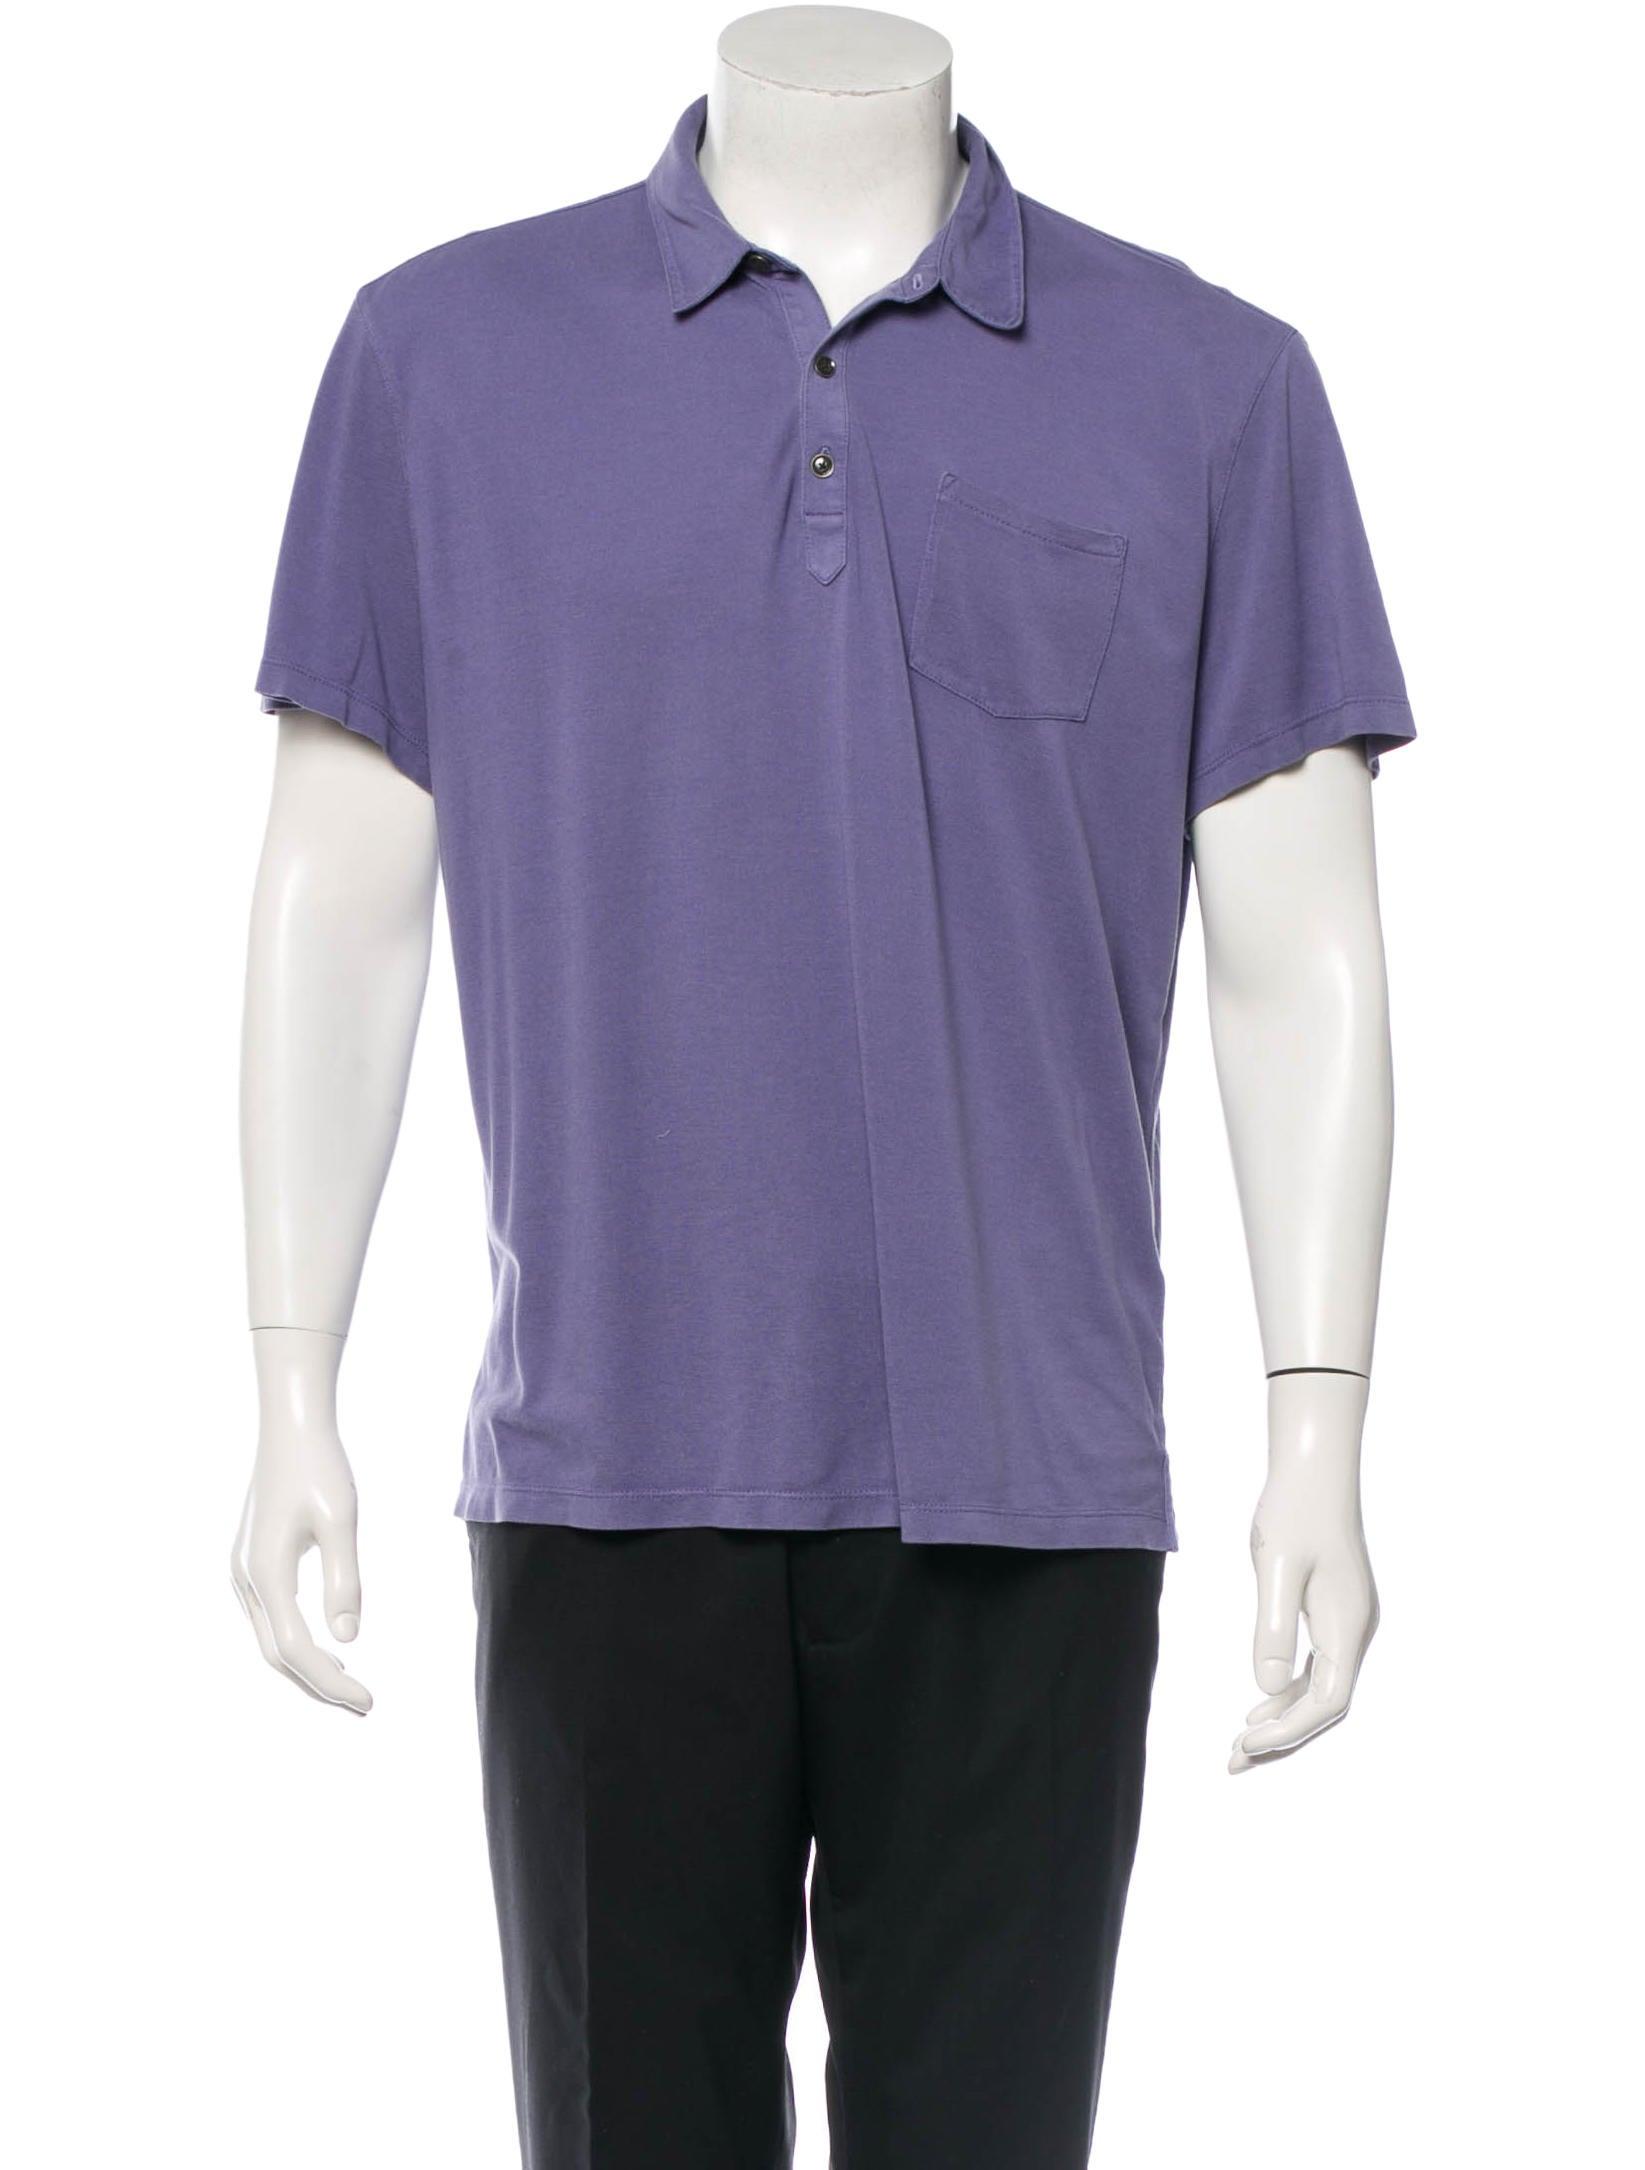 John Varvatos Silk Polo Shirt Clothing Jva20892 The